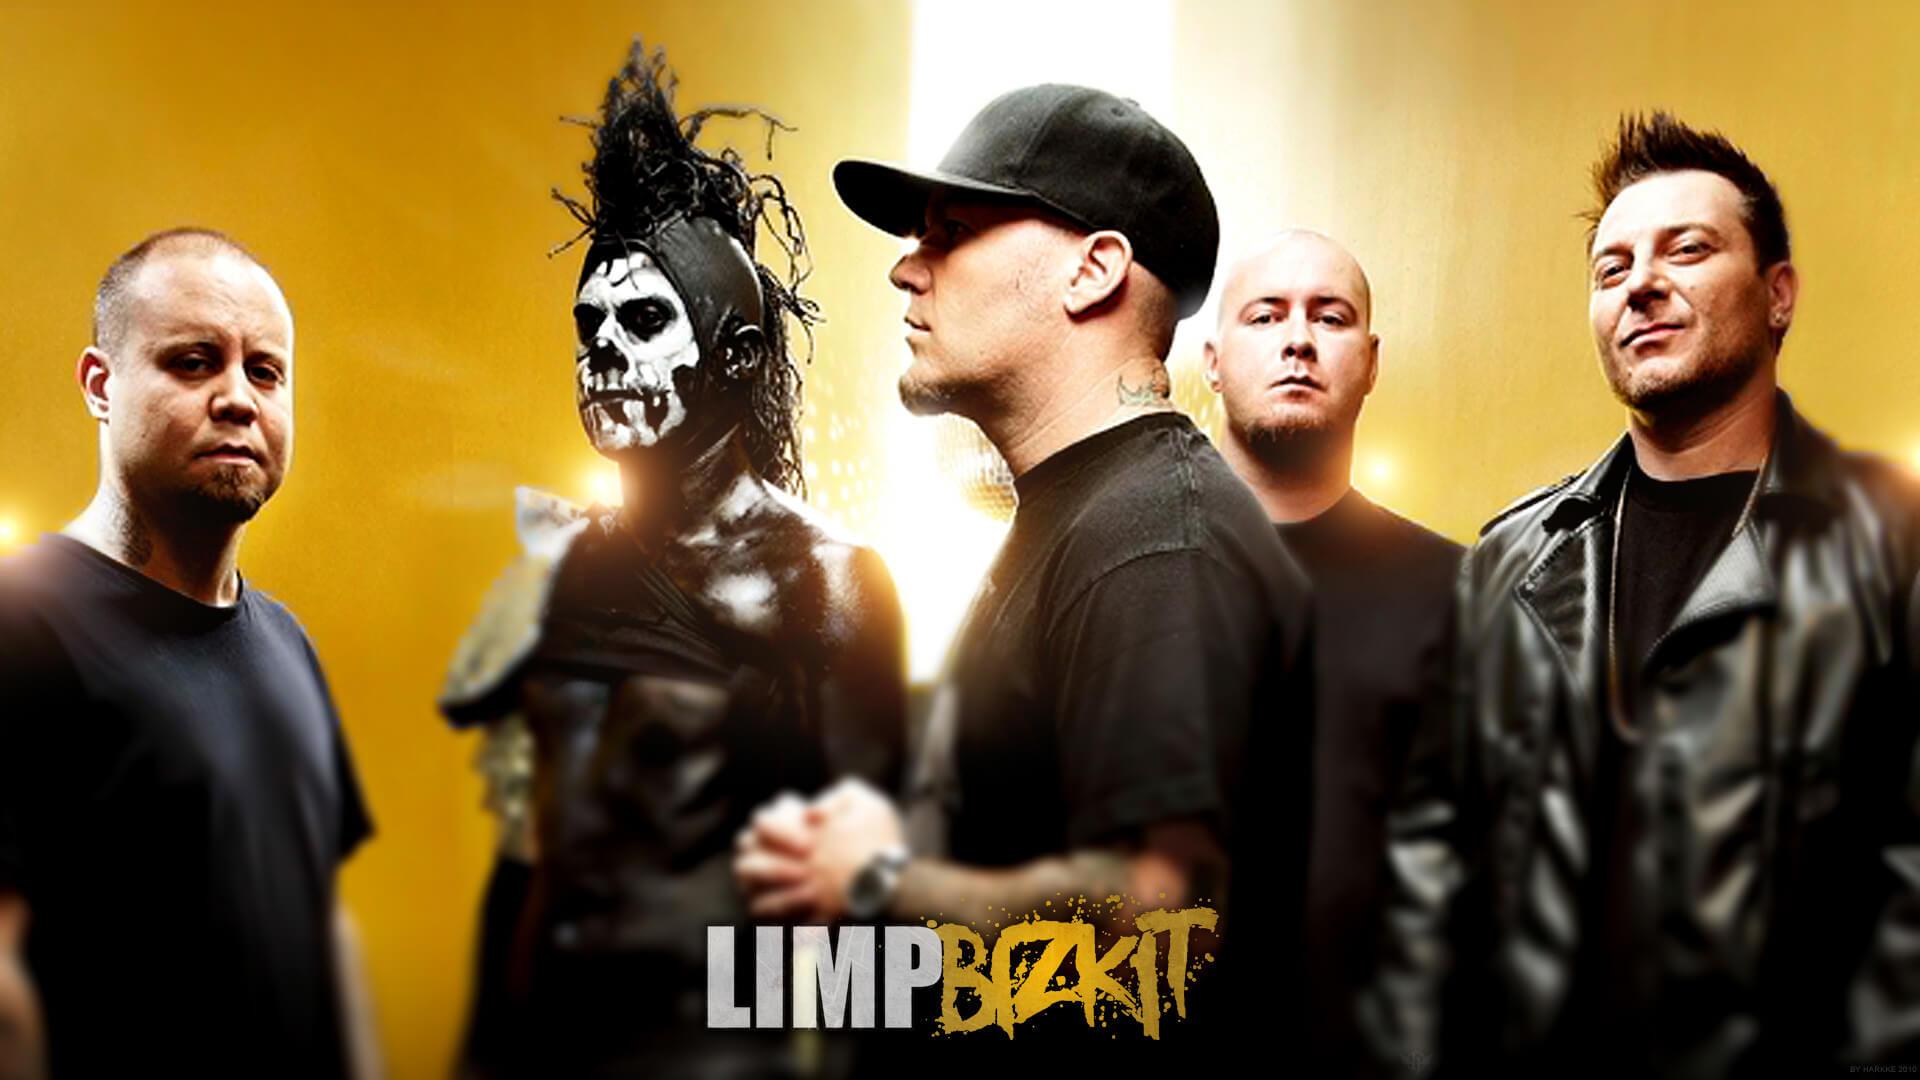 Limp Bizkit Feat. Lil'Wayne – Ready To Go – Official Video